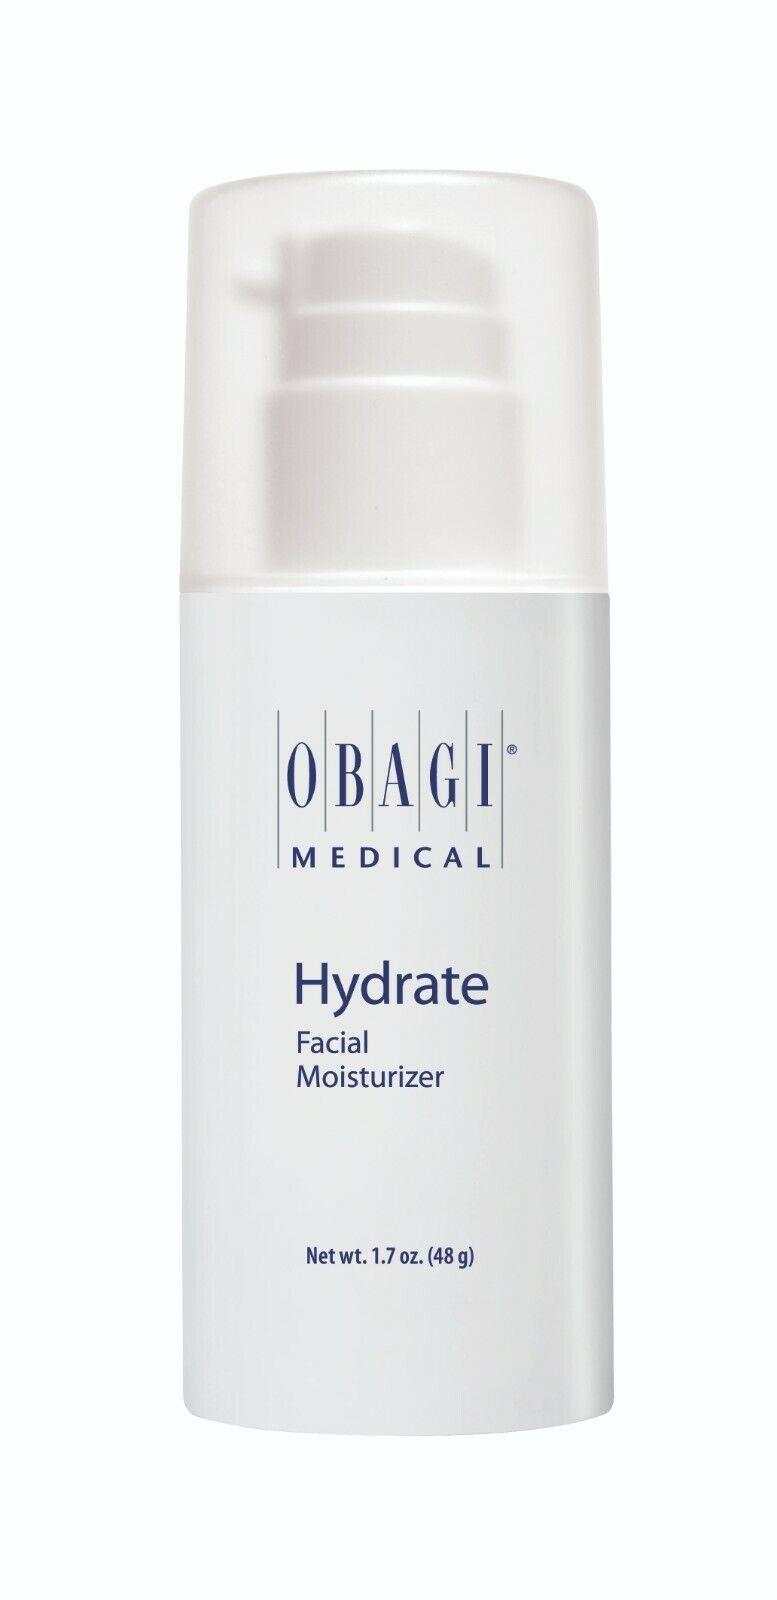 Obagi Hydrate 1.7 oz.